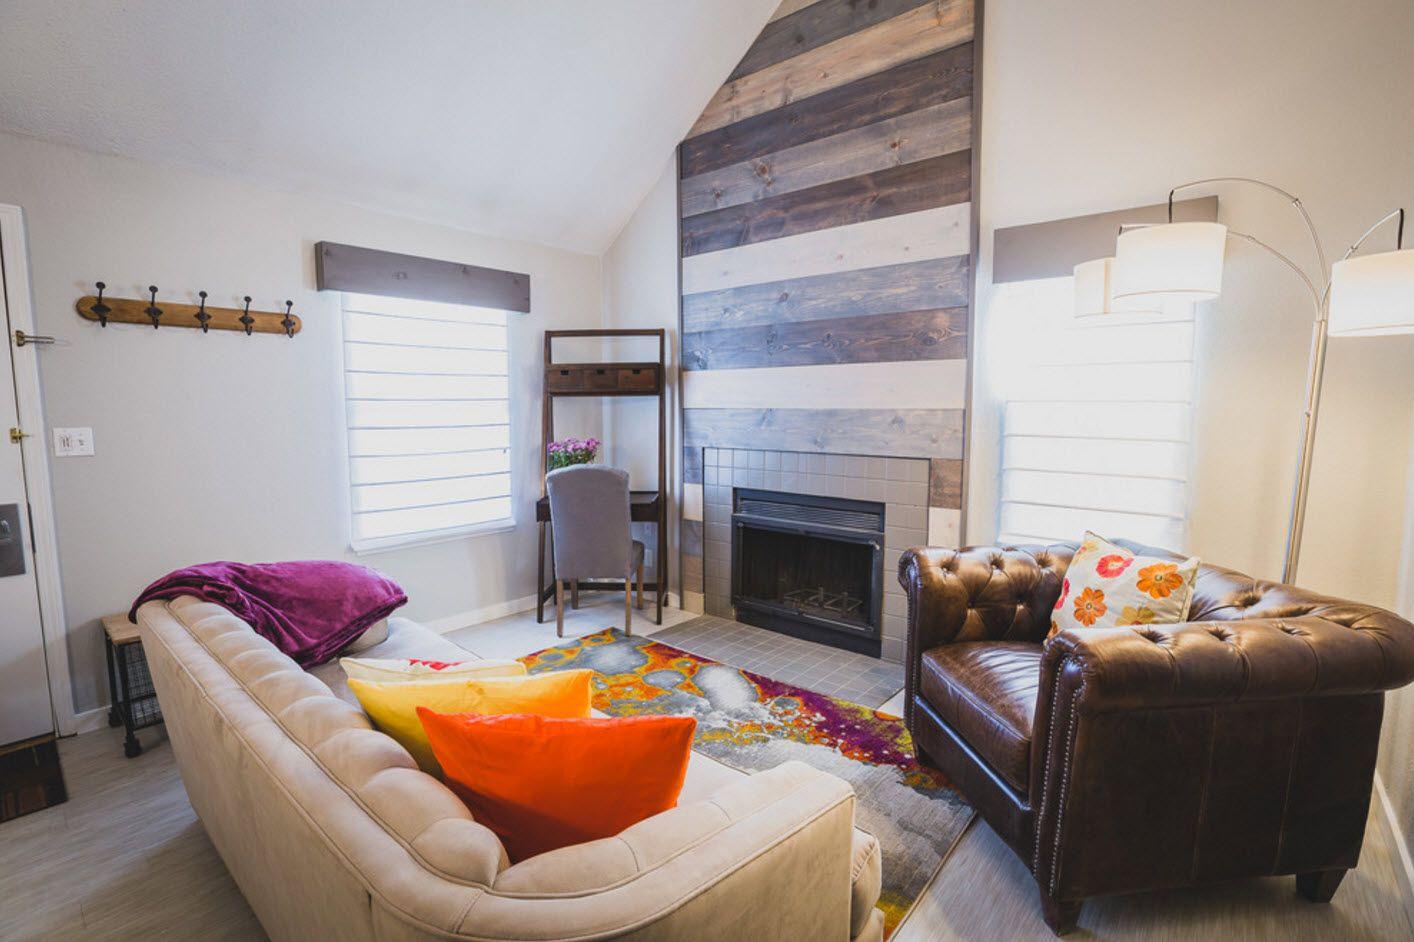 Apartment Design Inspiration apartment interior design inspiration ideas & trends 2017 - small